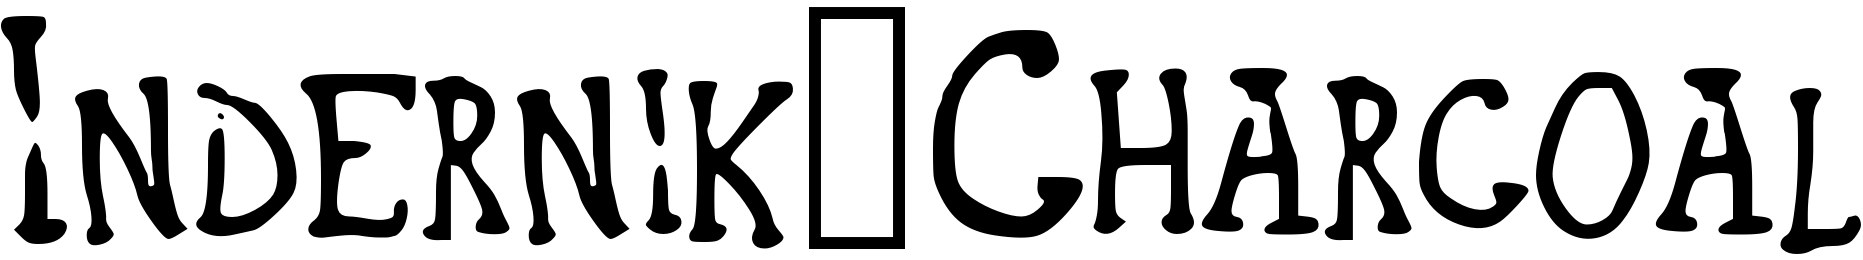 Indernik_Charcoal